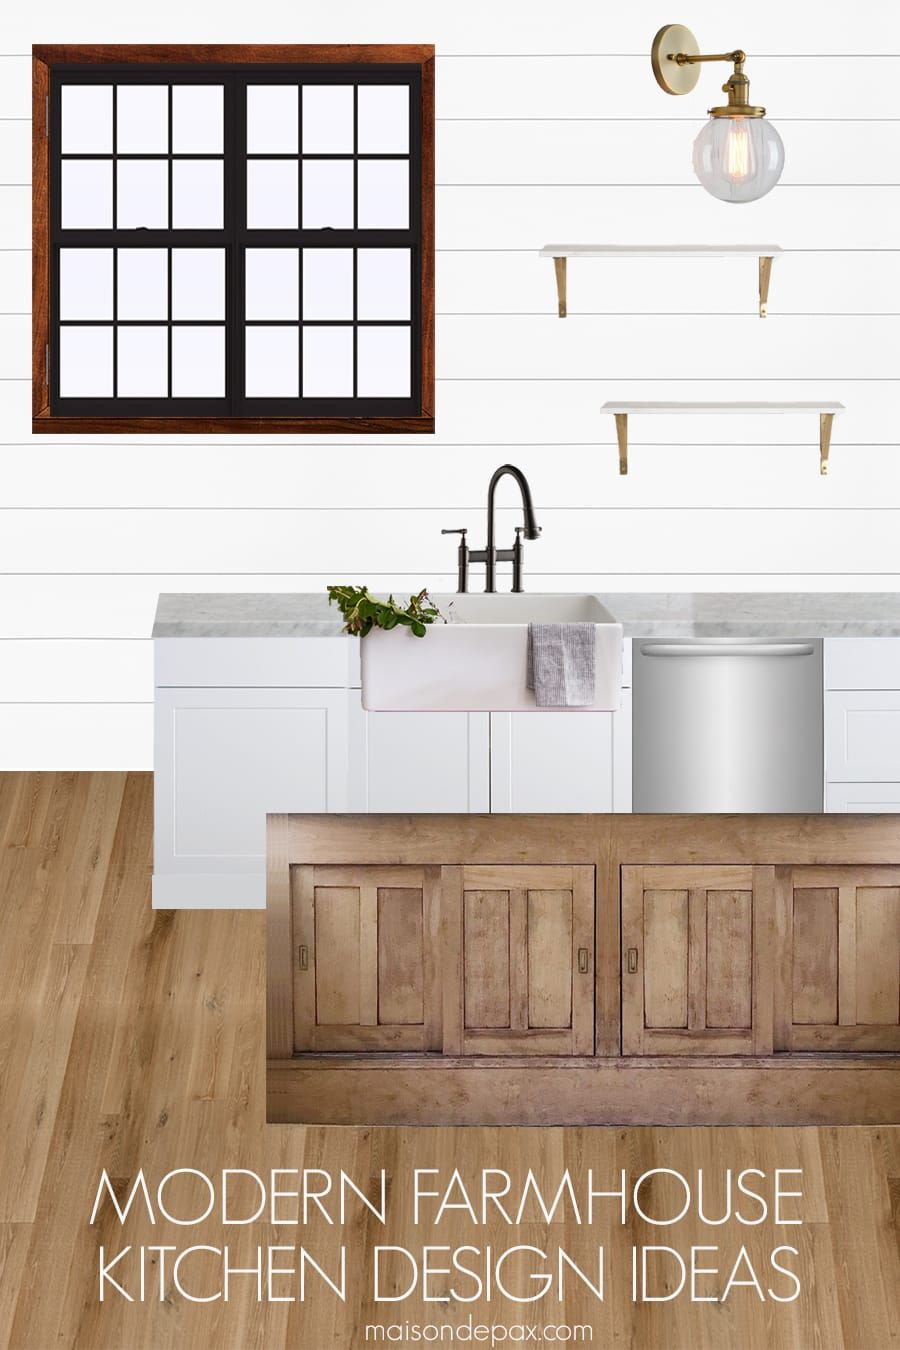 modern farmhouse kitchen design ideas get 8 tips for a gorgeous modern farmhouse look